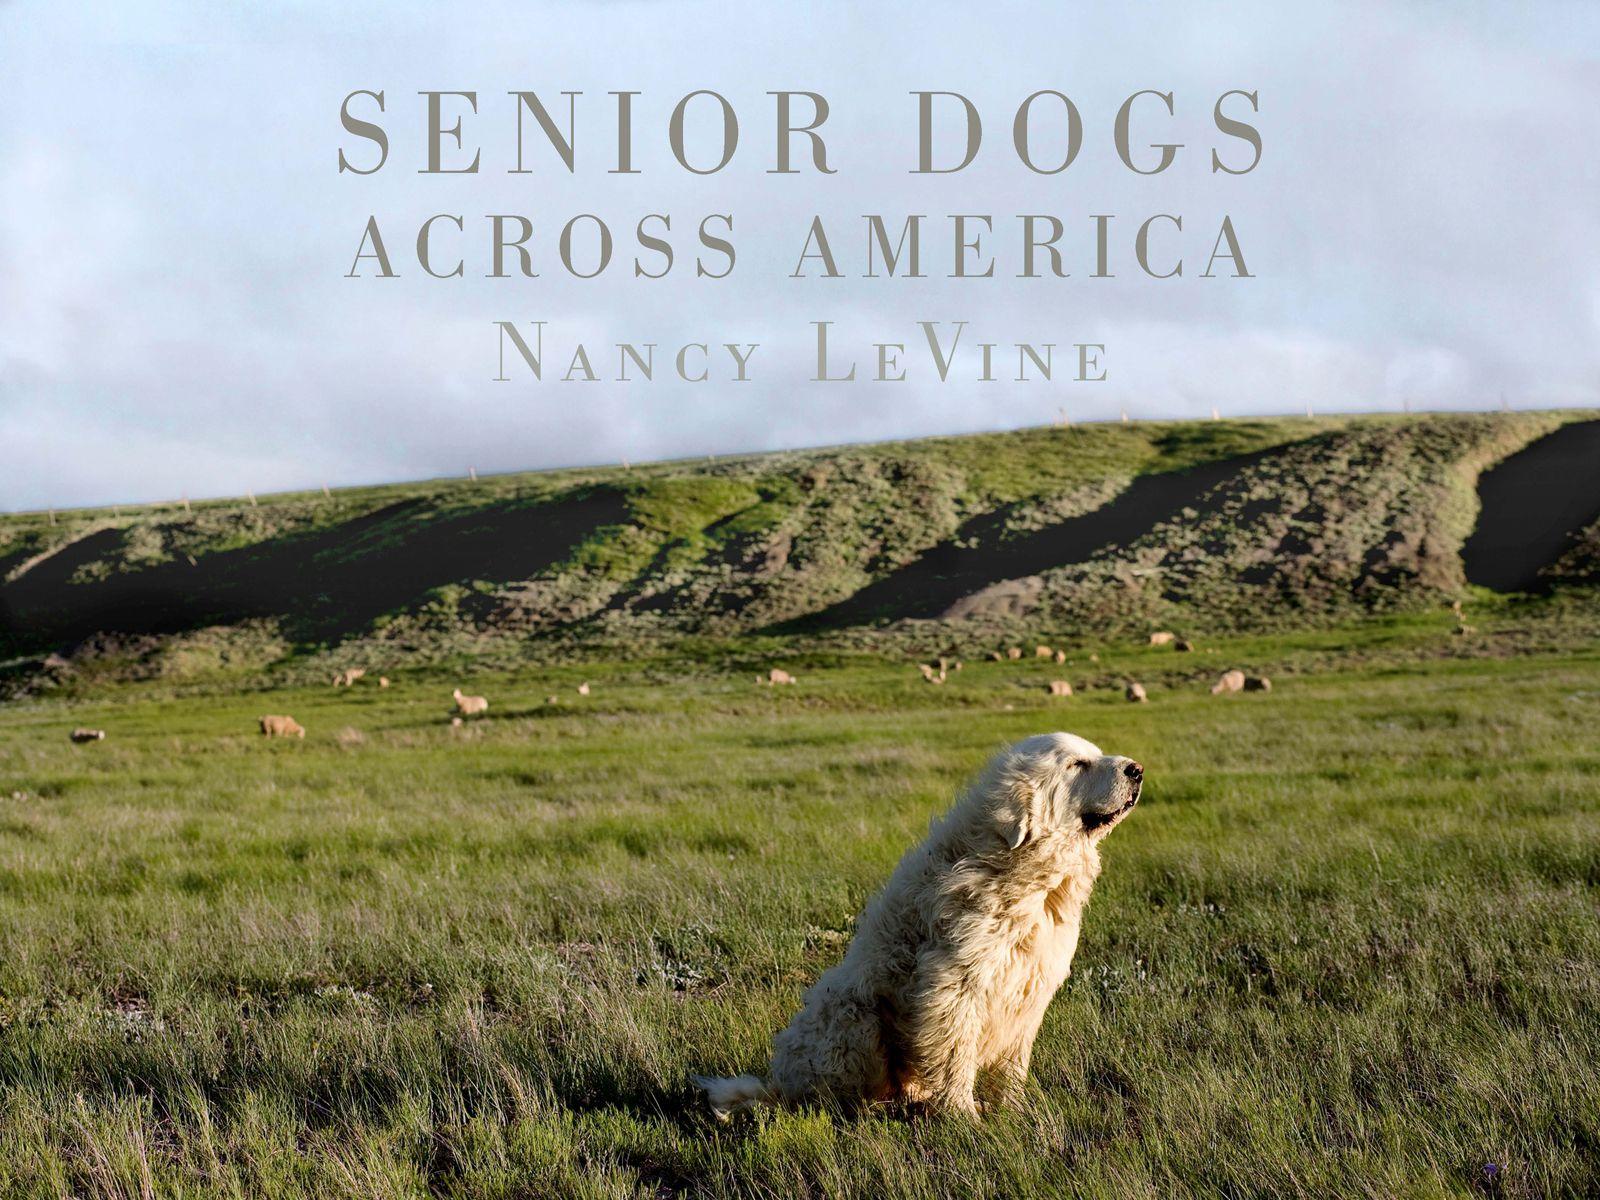 Senior Dogs Across America Photo Book